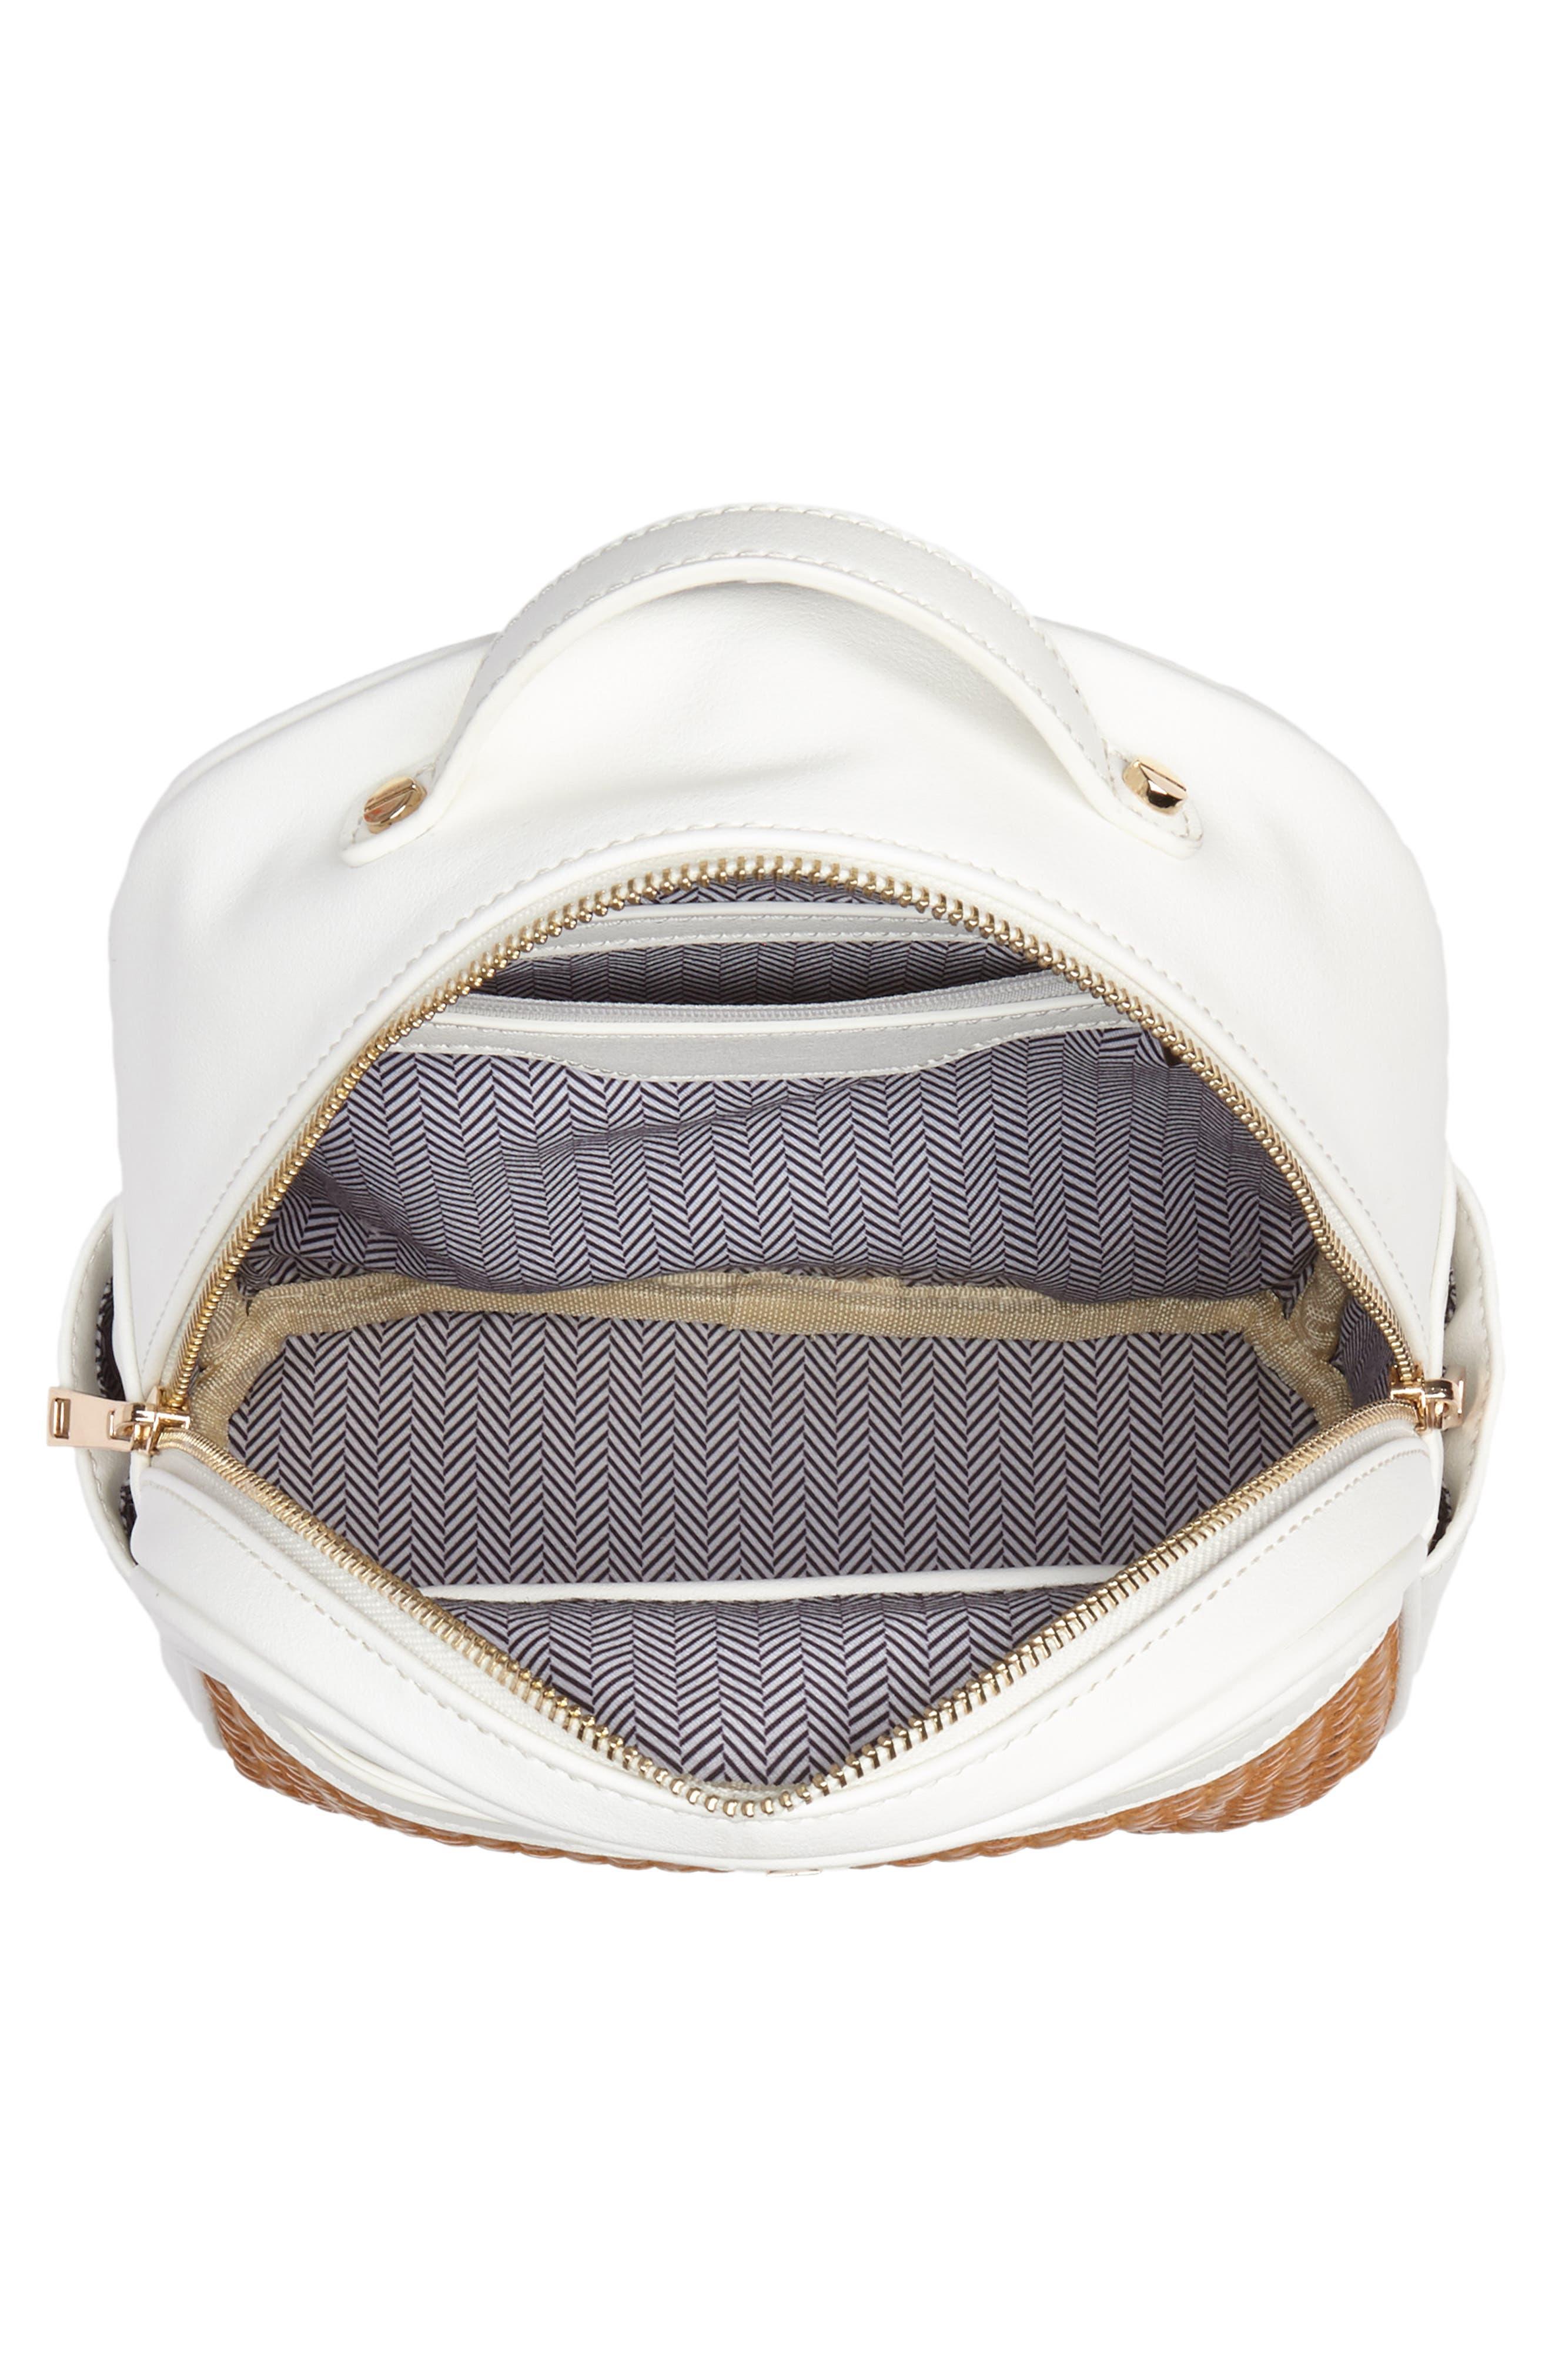 Mali + Lili Harper Lili Basket Weave Backpack,                             Alternate thumbnail 4, color,                             White